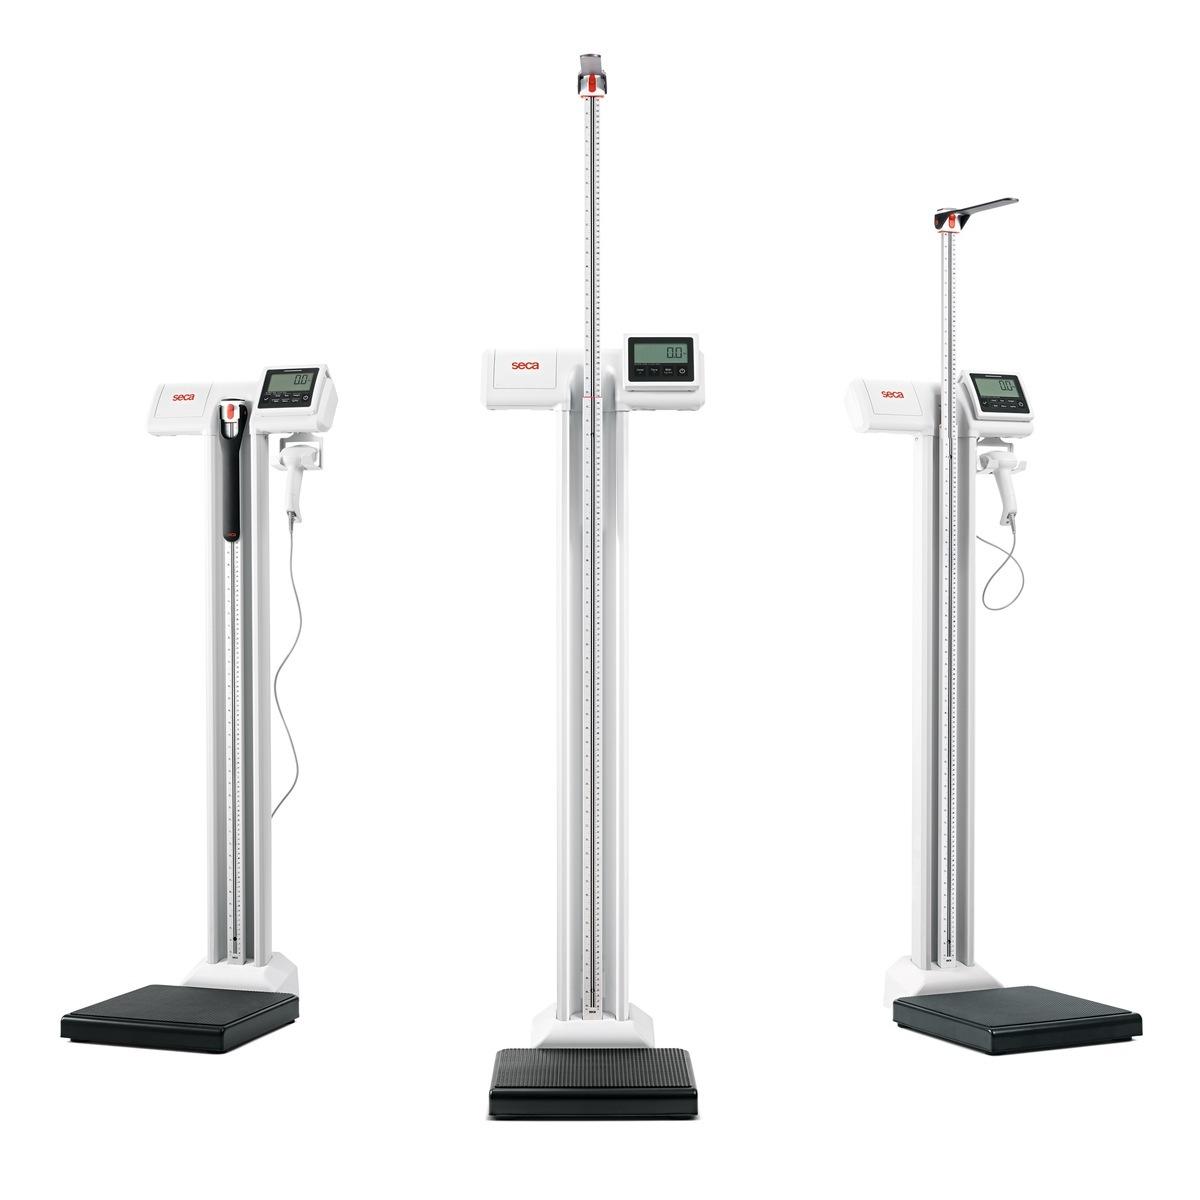 seca launches EMR validated line of column scales designed